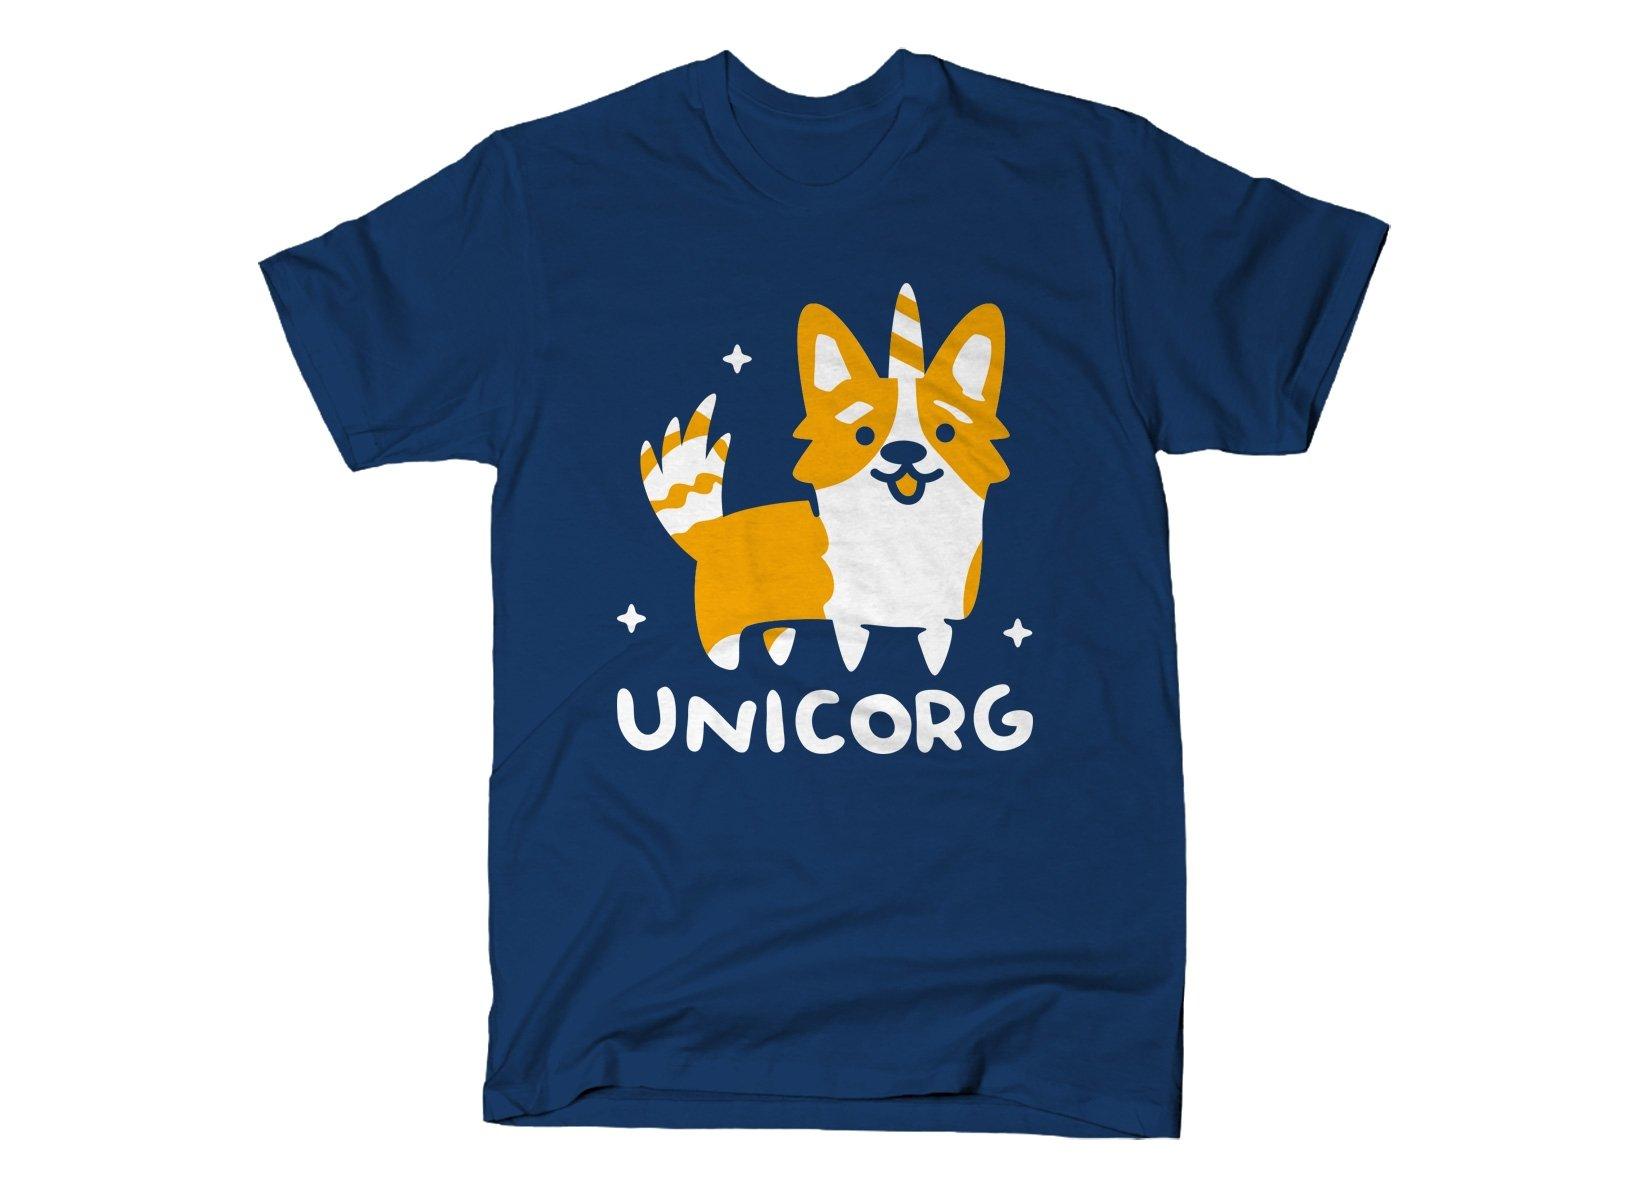 Unicorg on Mens T-Shirt